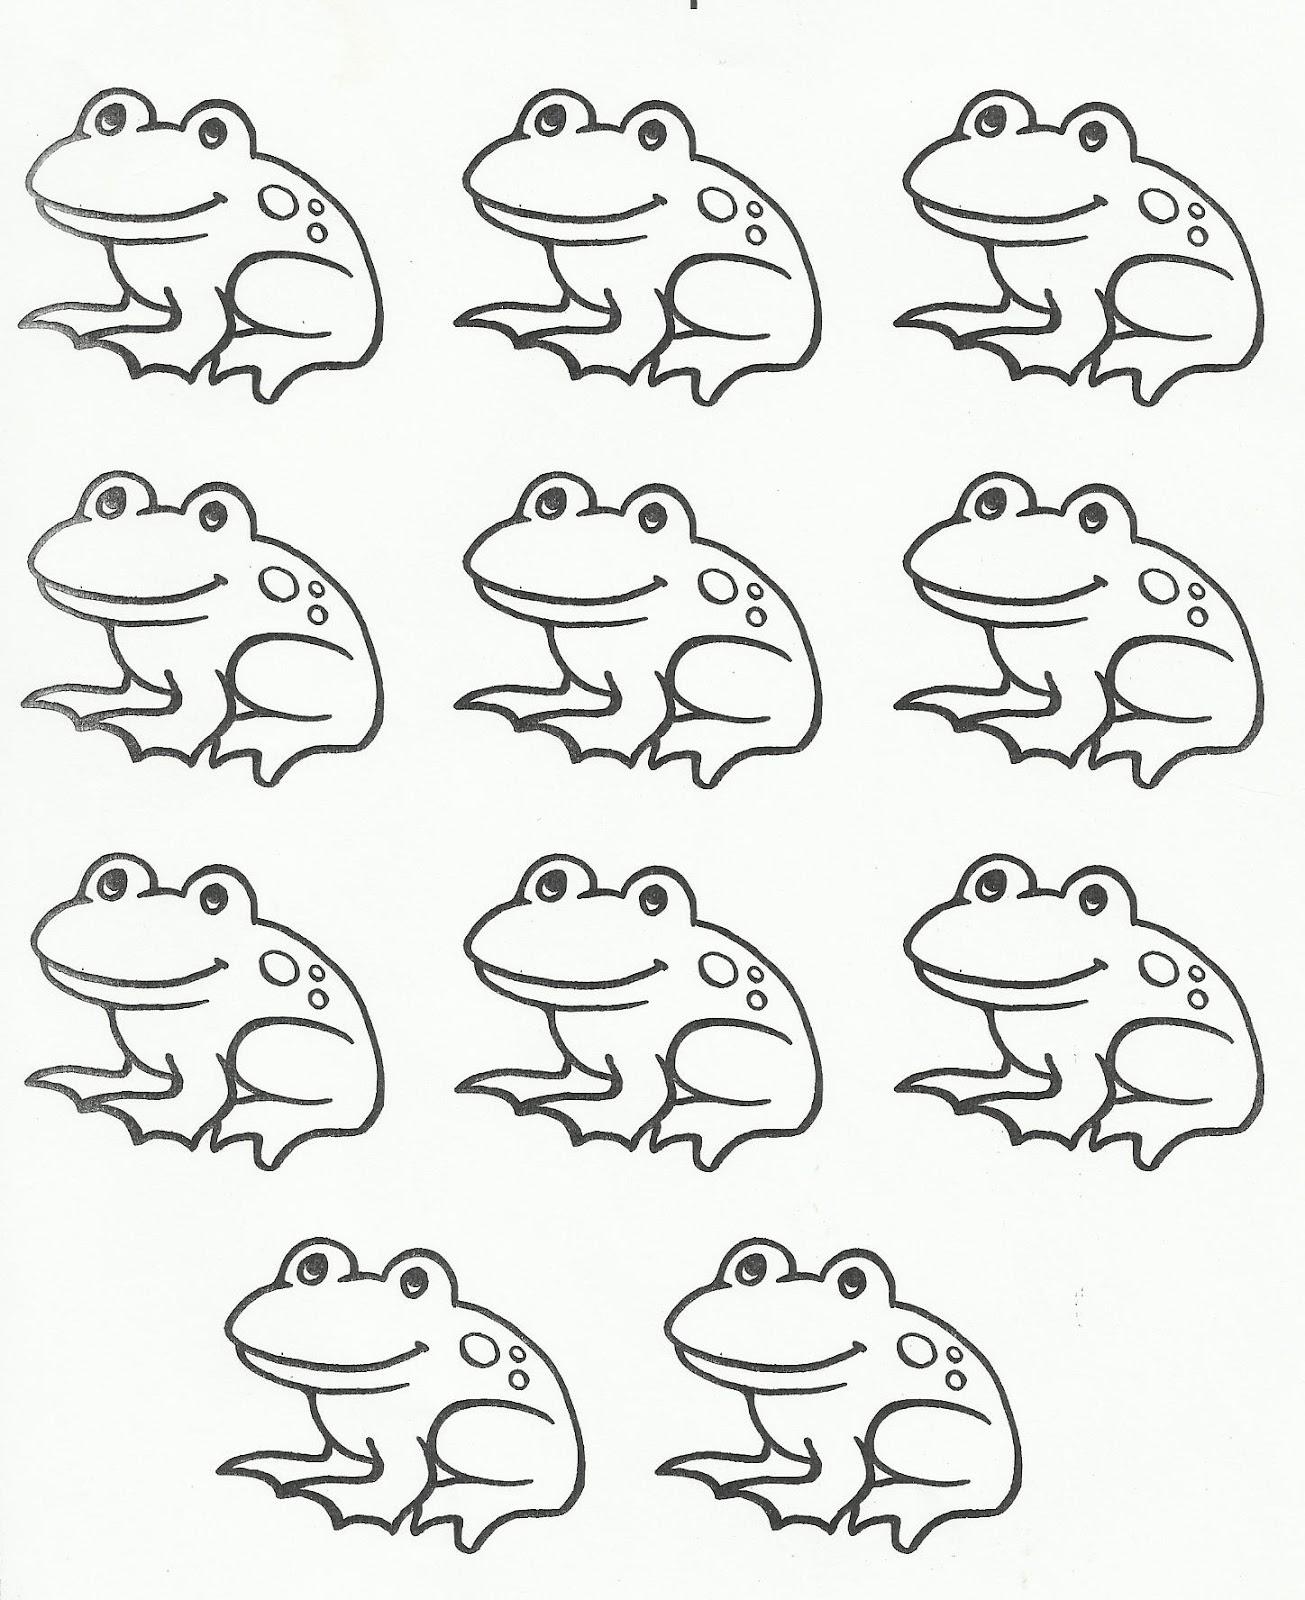 Squish Preschool Ideas Tadpole To Frog